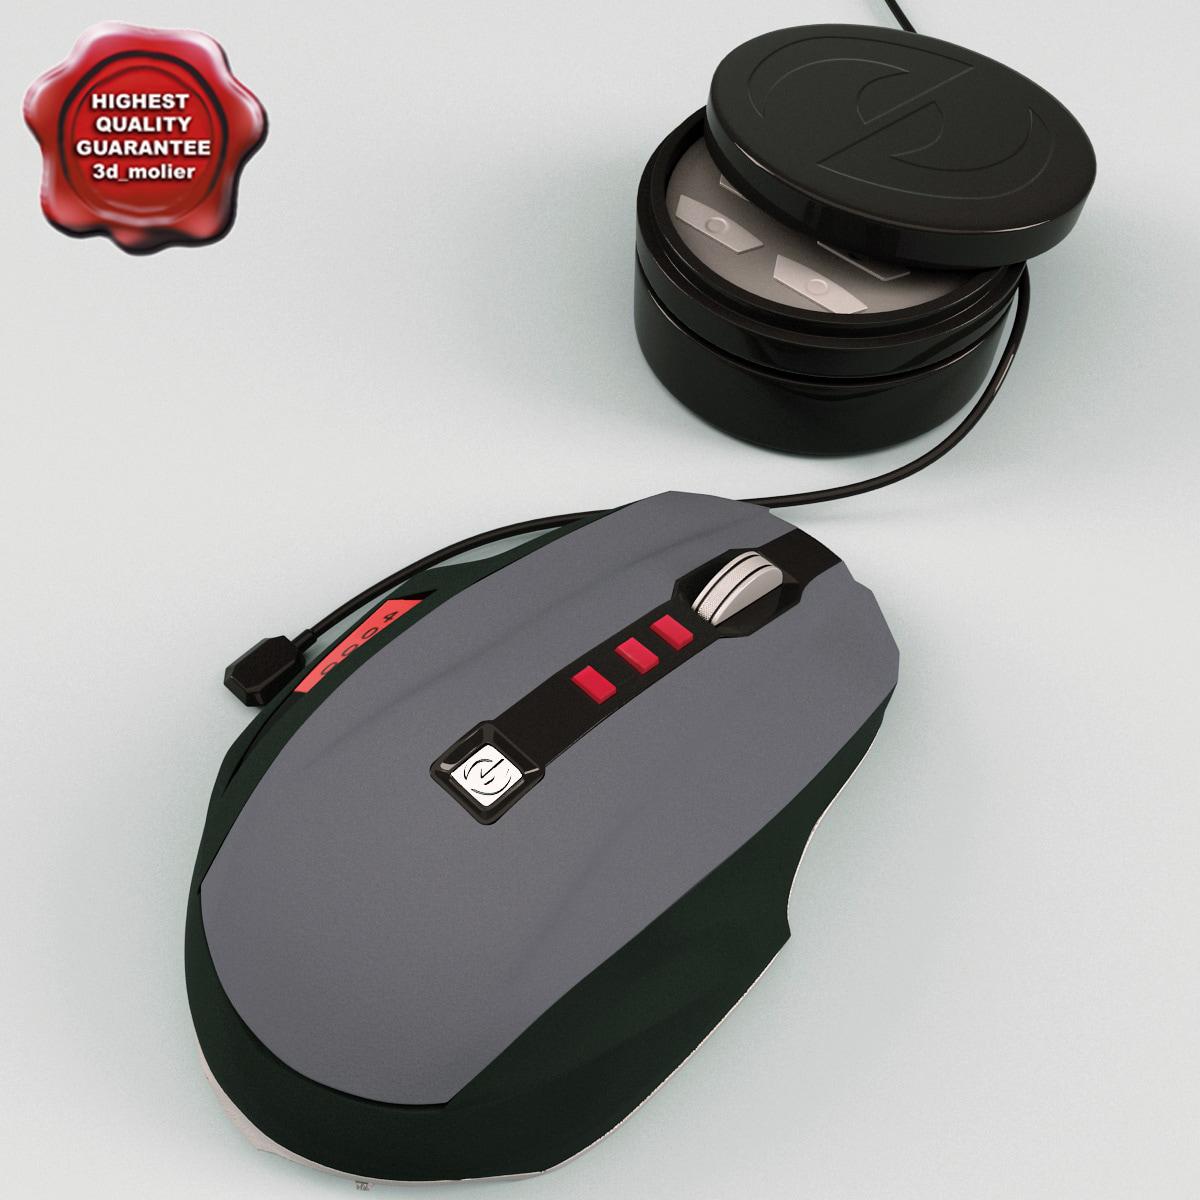 Microsoft_Sidewinder_Mouse_00.jpg